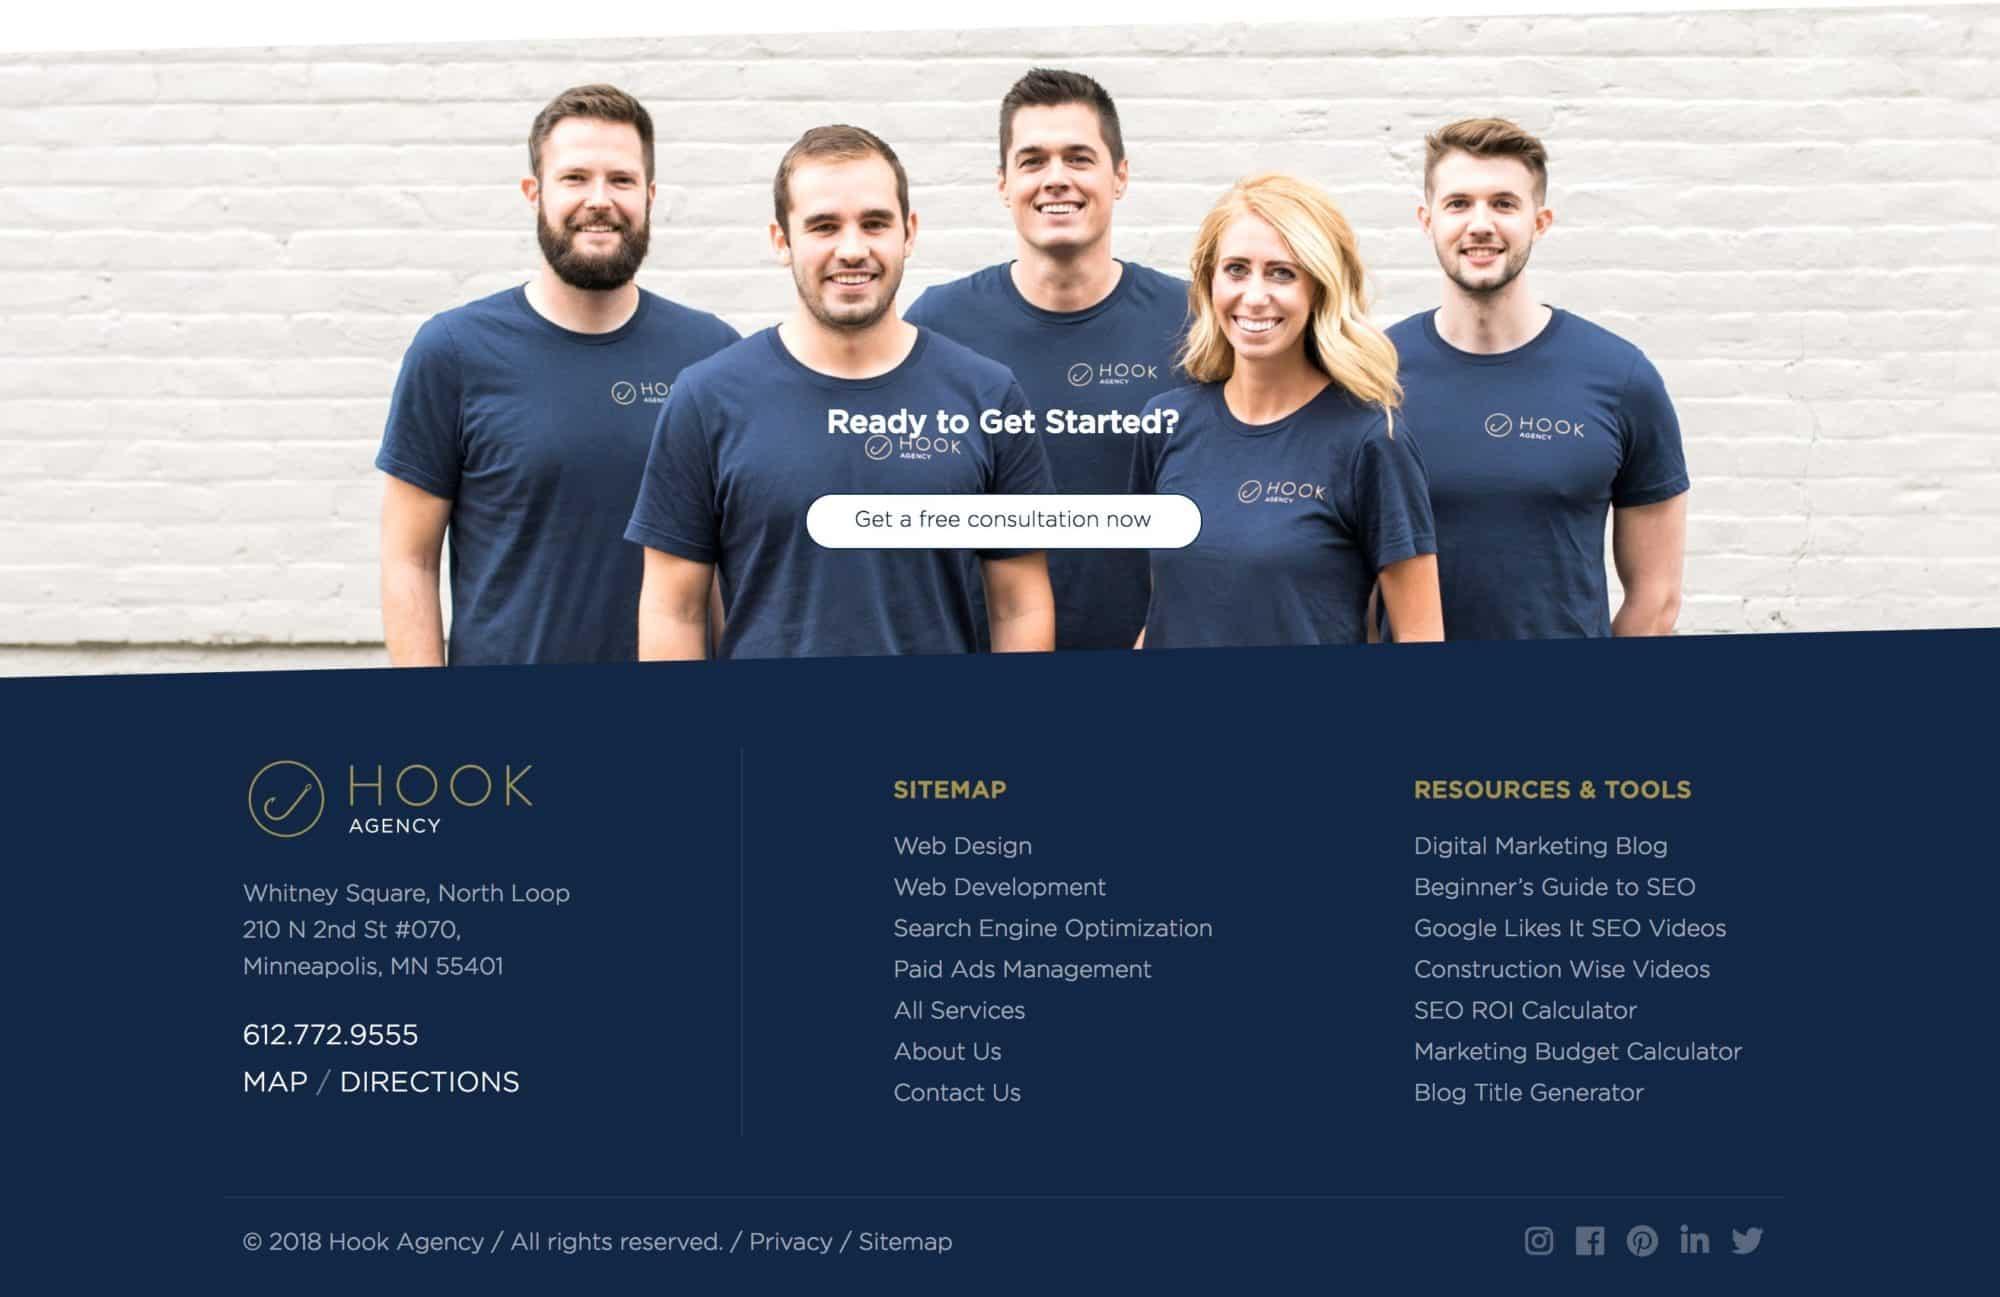 Hook Agency - Agency Footer Design Inspiration